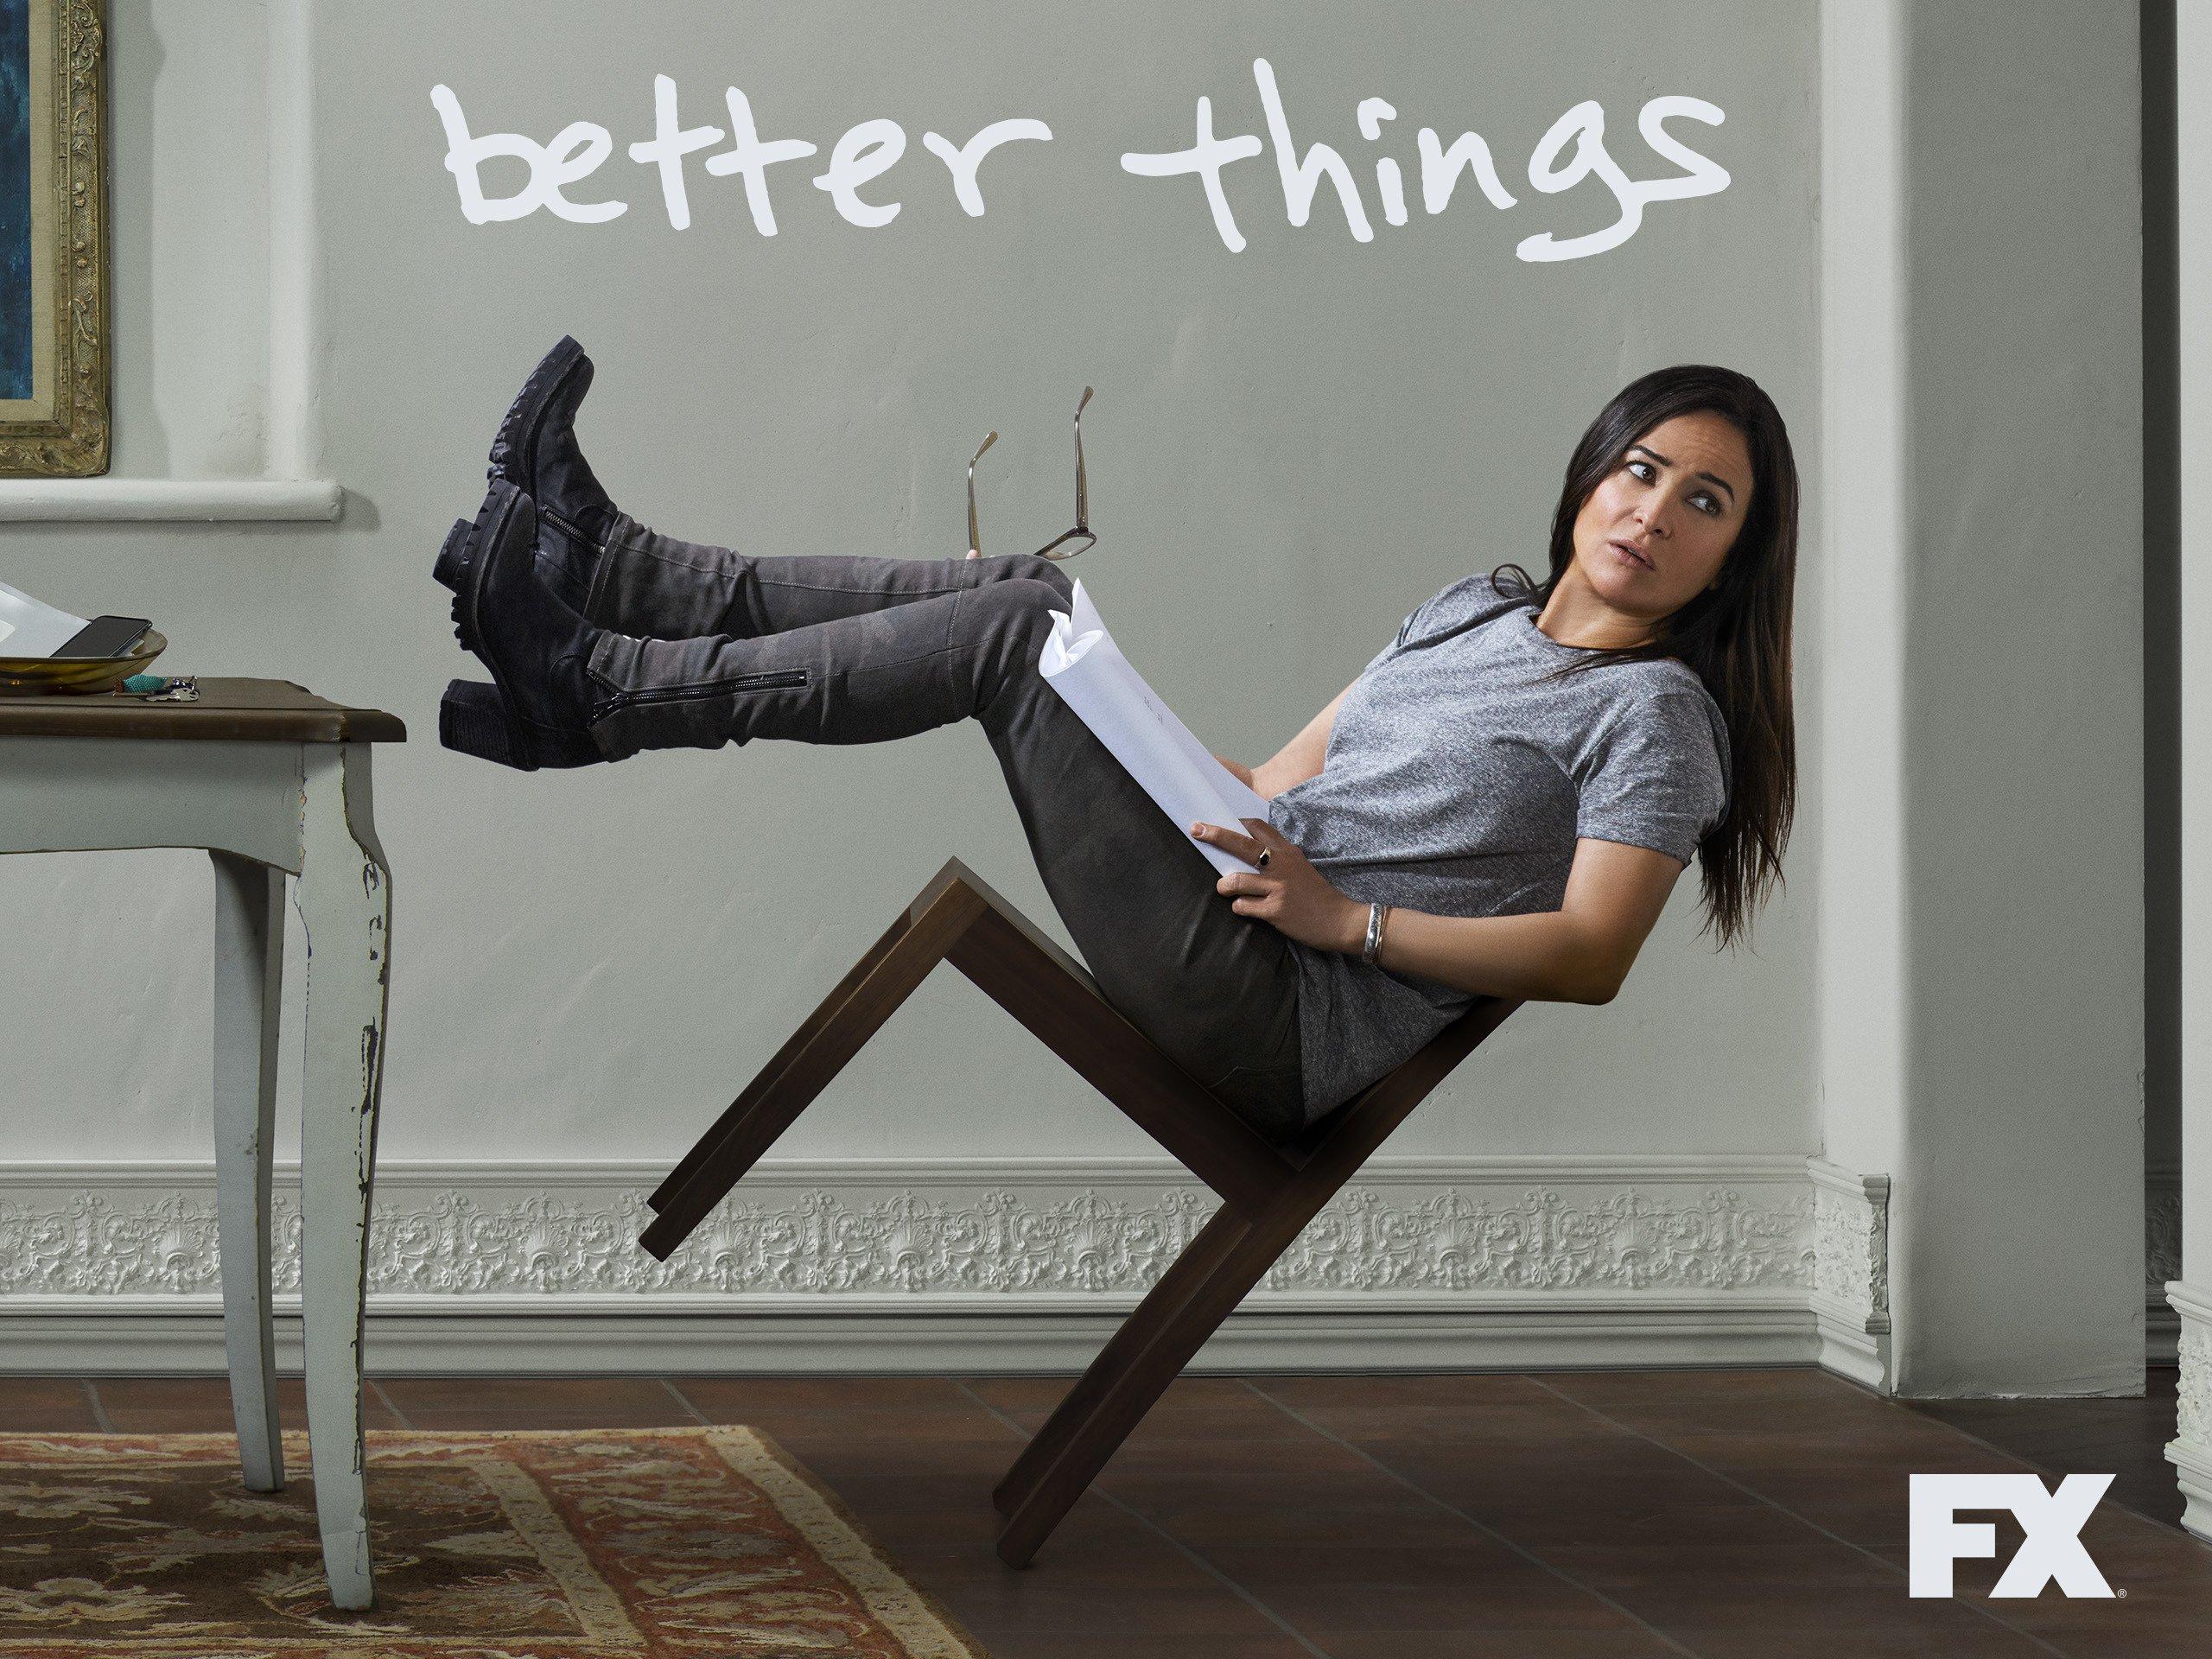 Better Things Season 5 Renewal Confirmed by Pamela Adlon on FX, Story Updates